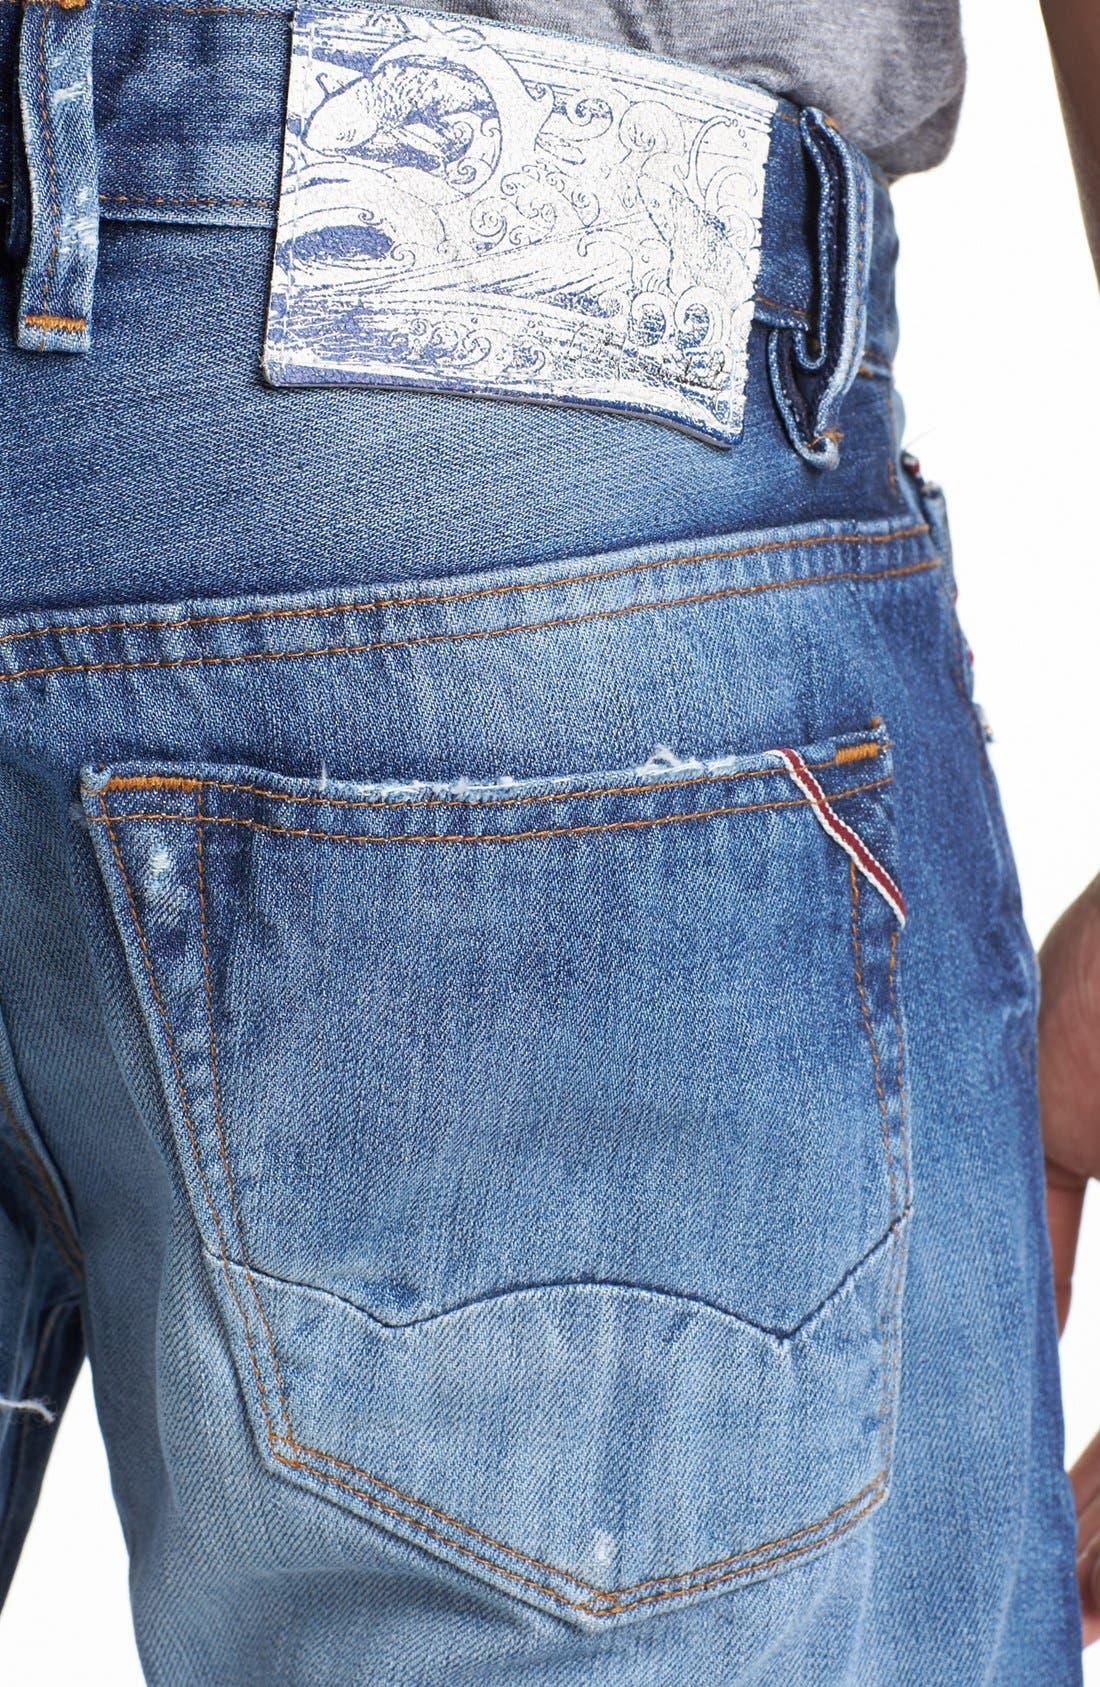 Alternate Image 4  - Cult of Individuality 'Rebel' Straight Leg Selvedge Jeans (Riverside)